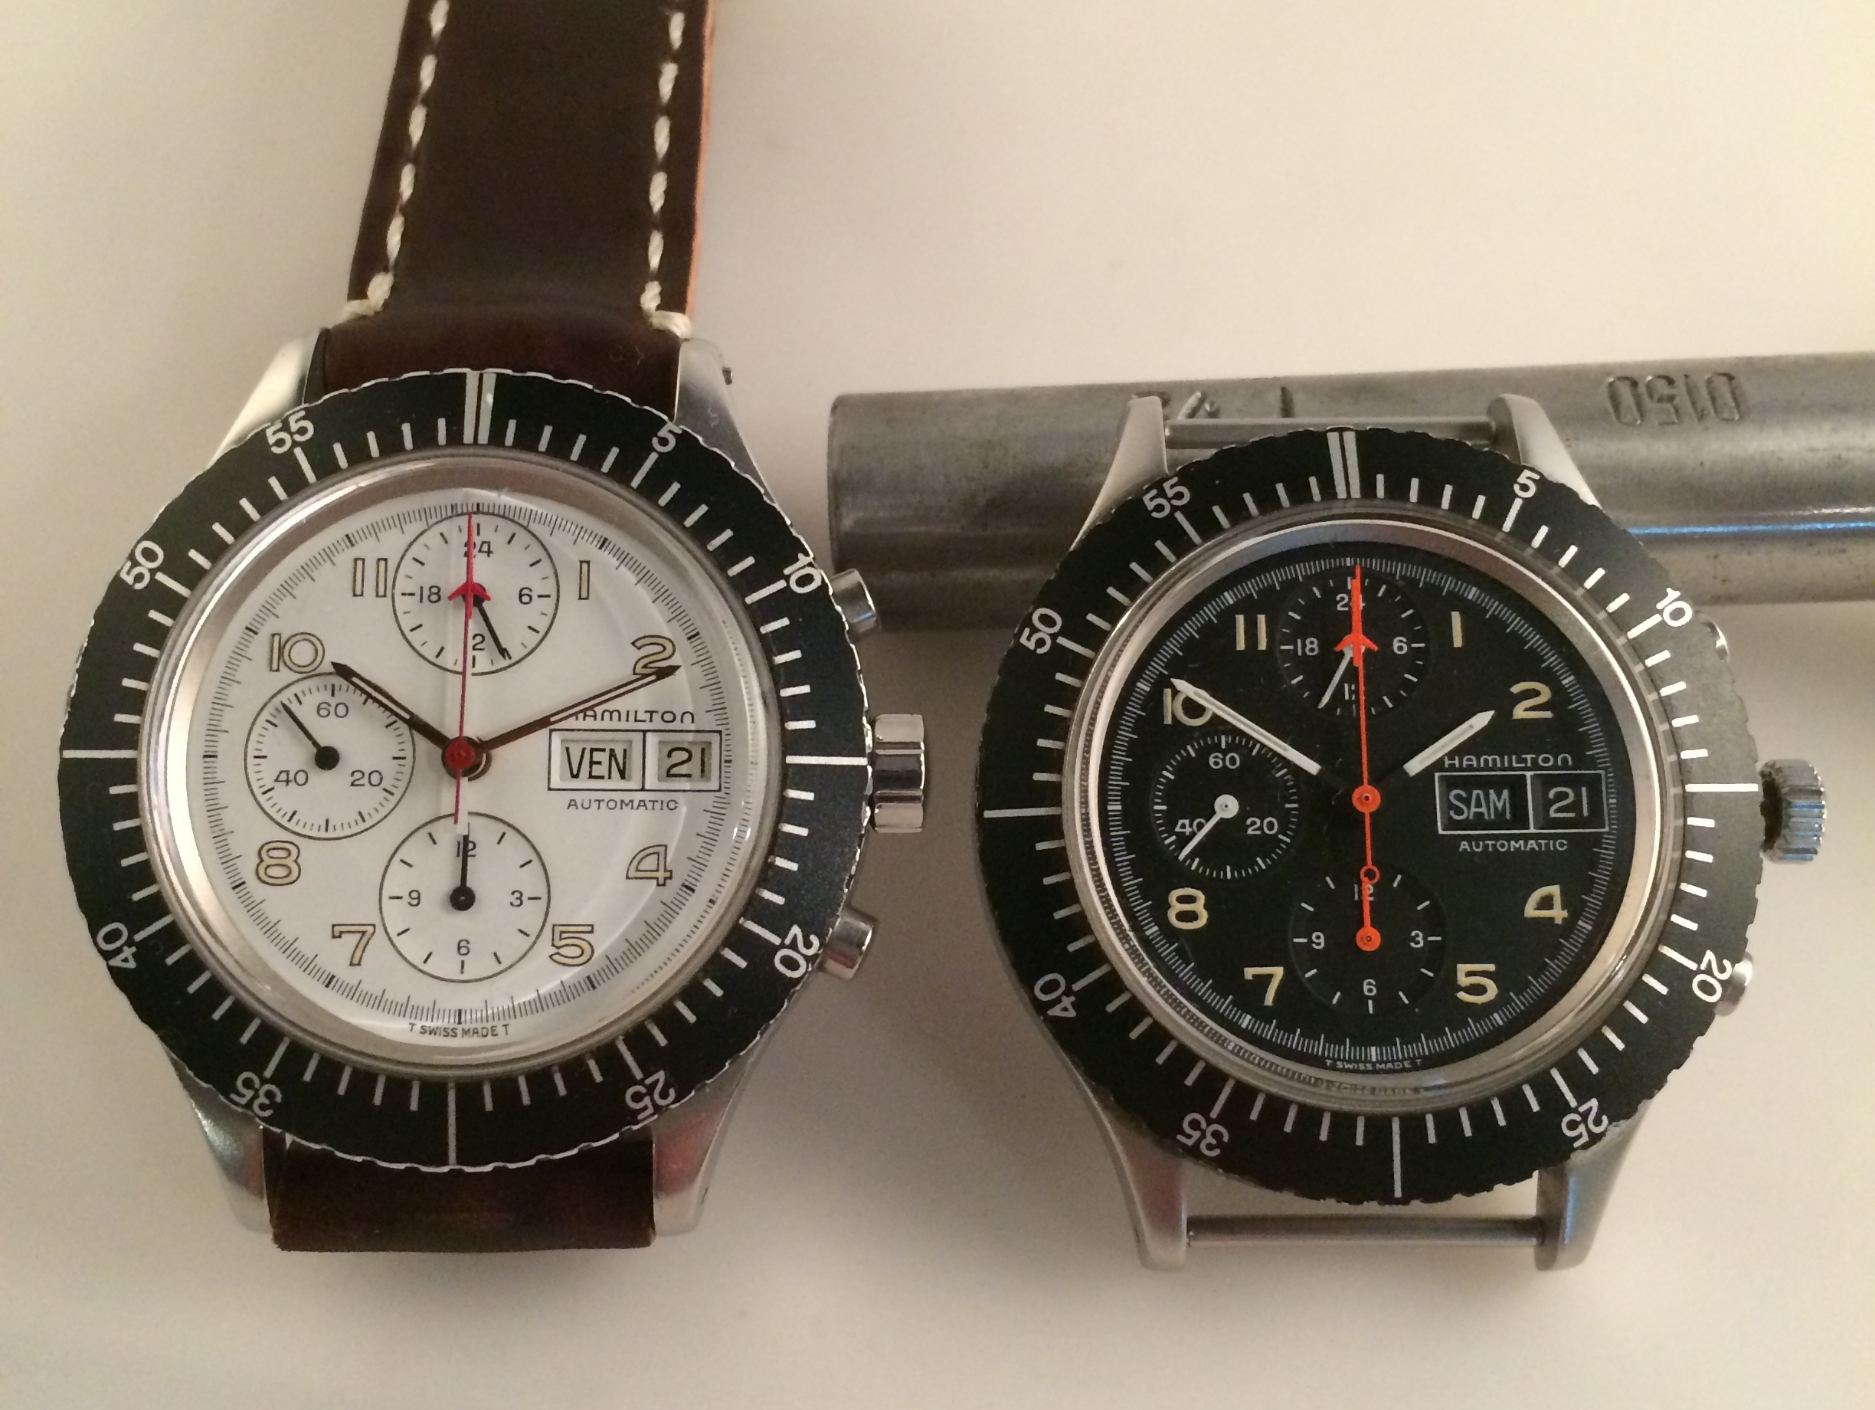 Hamilton Lemania 5100 chronographs.